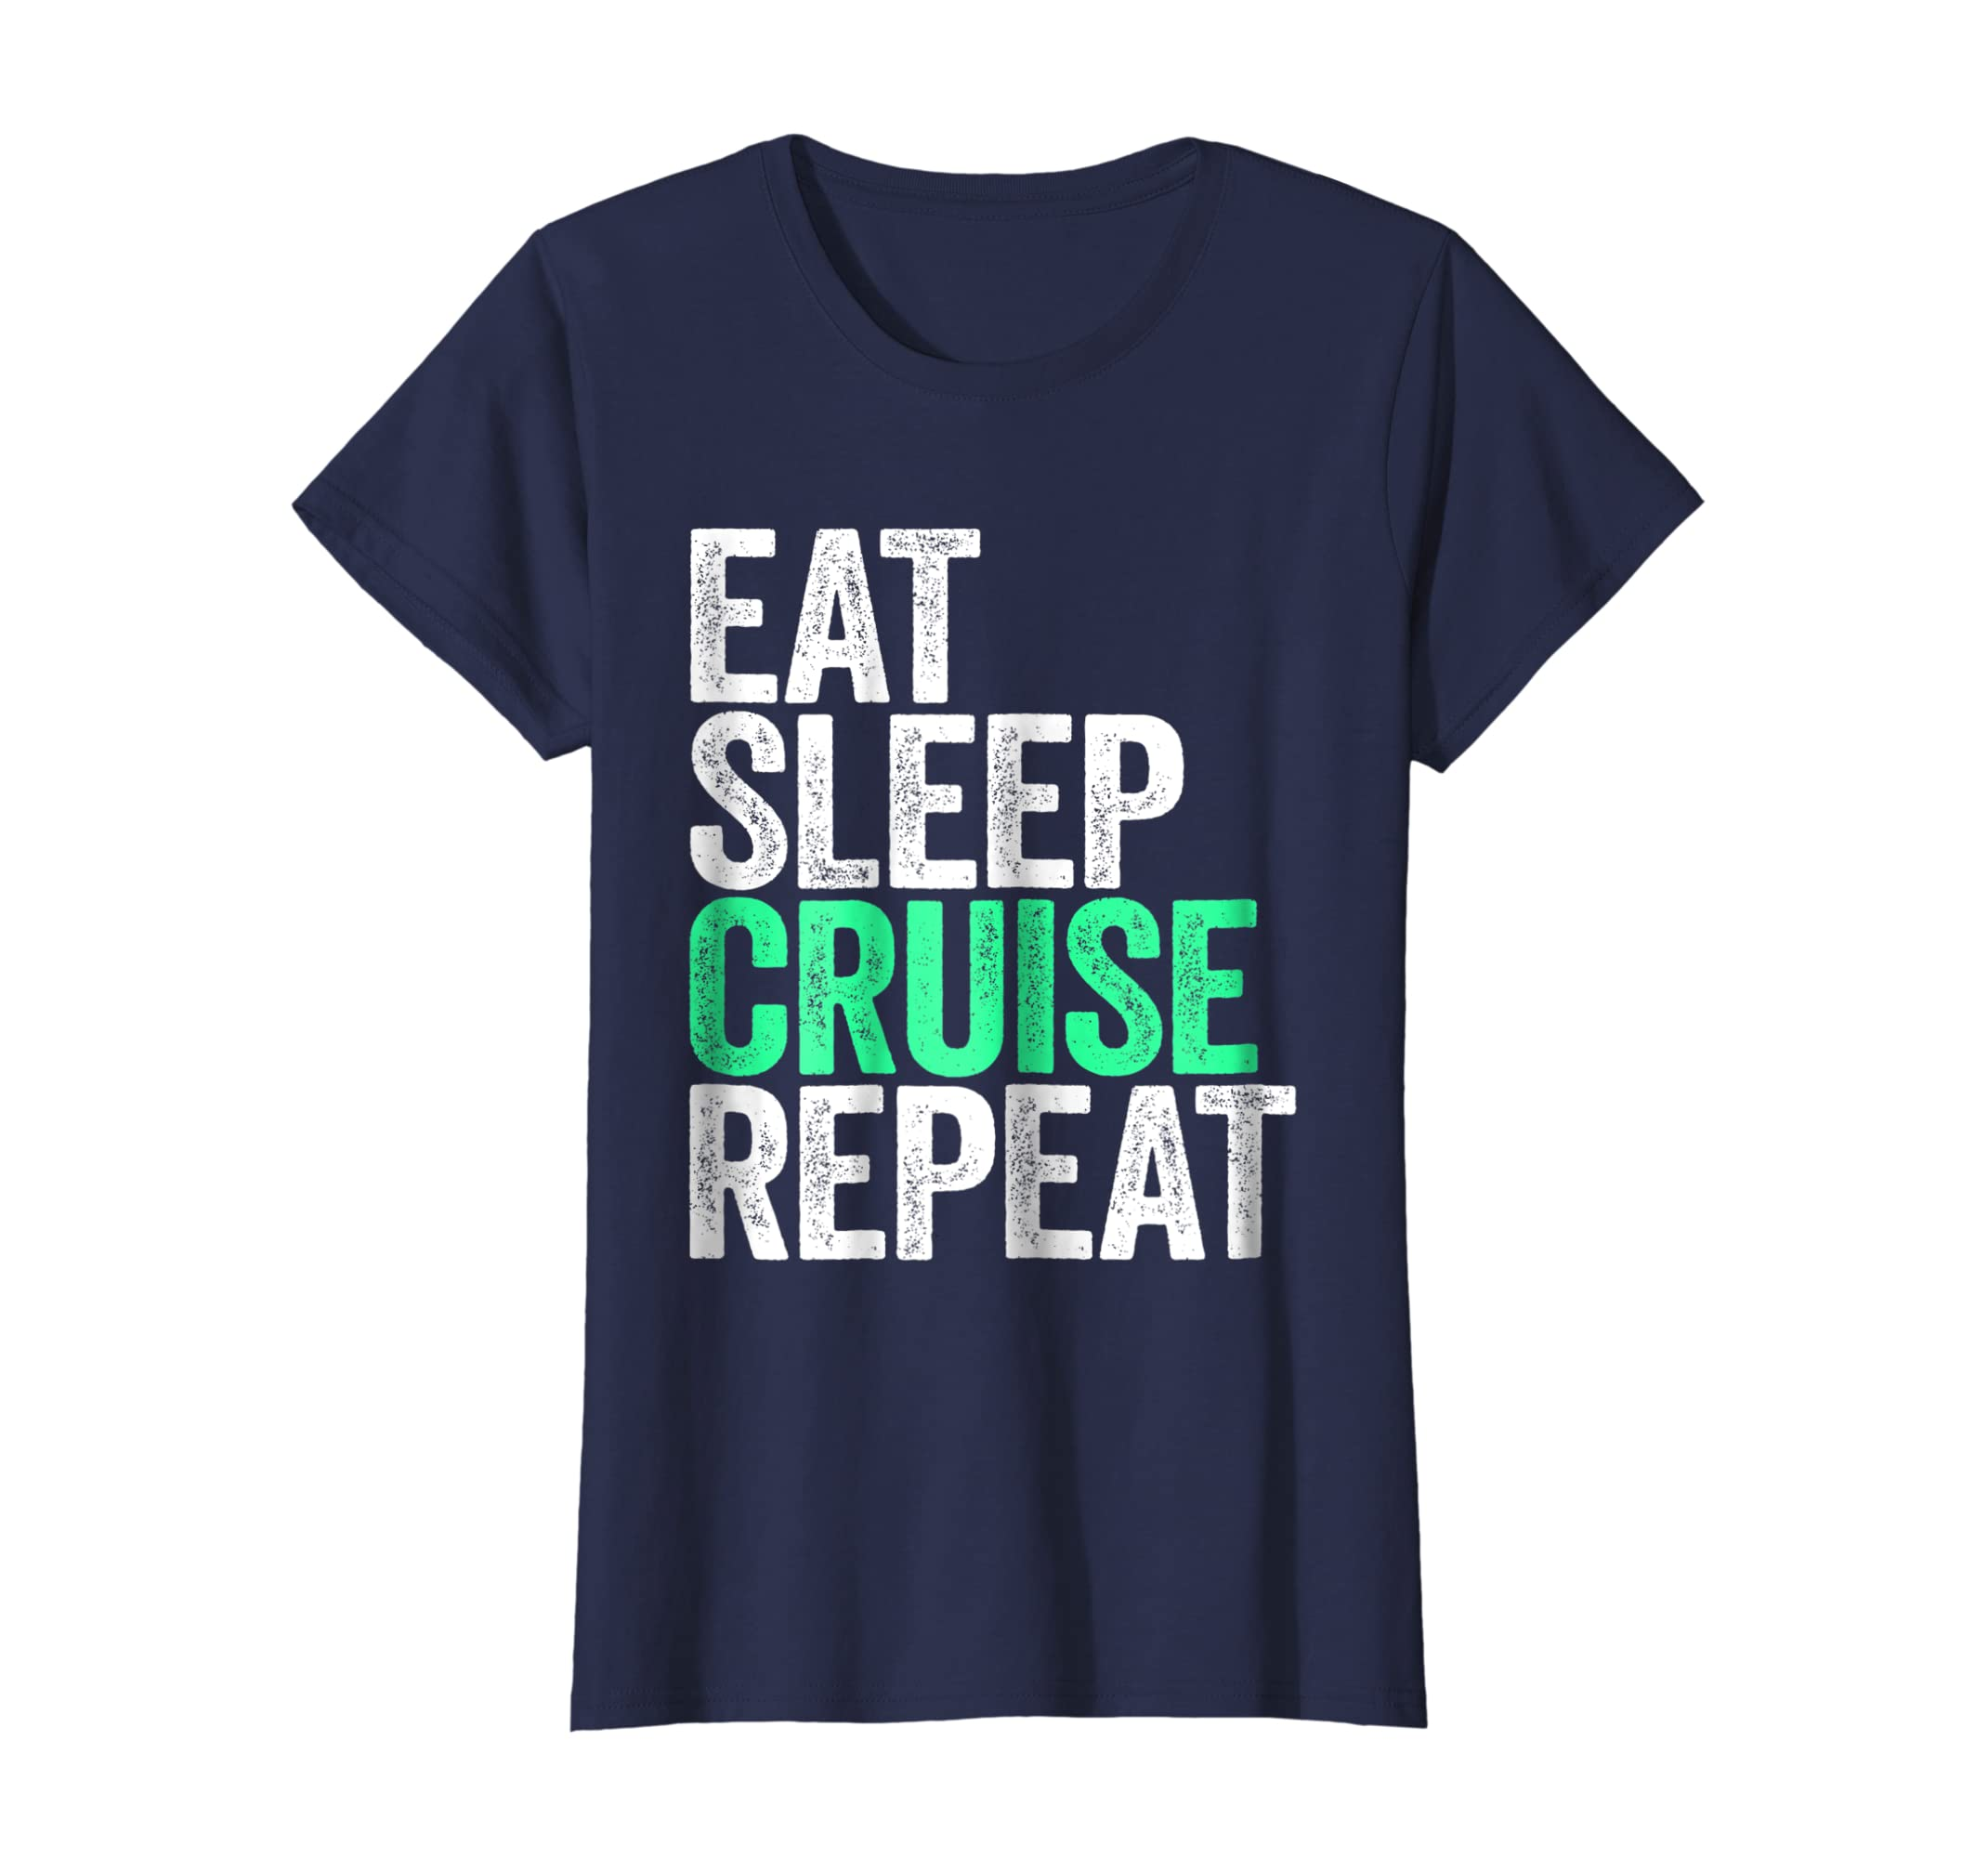 36fa06f8 Amazon.com: Eat Sleep Cruise Repeat T-Shirt Holiday Vacation Gift: Clothing